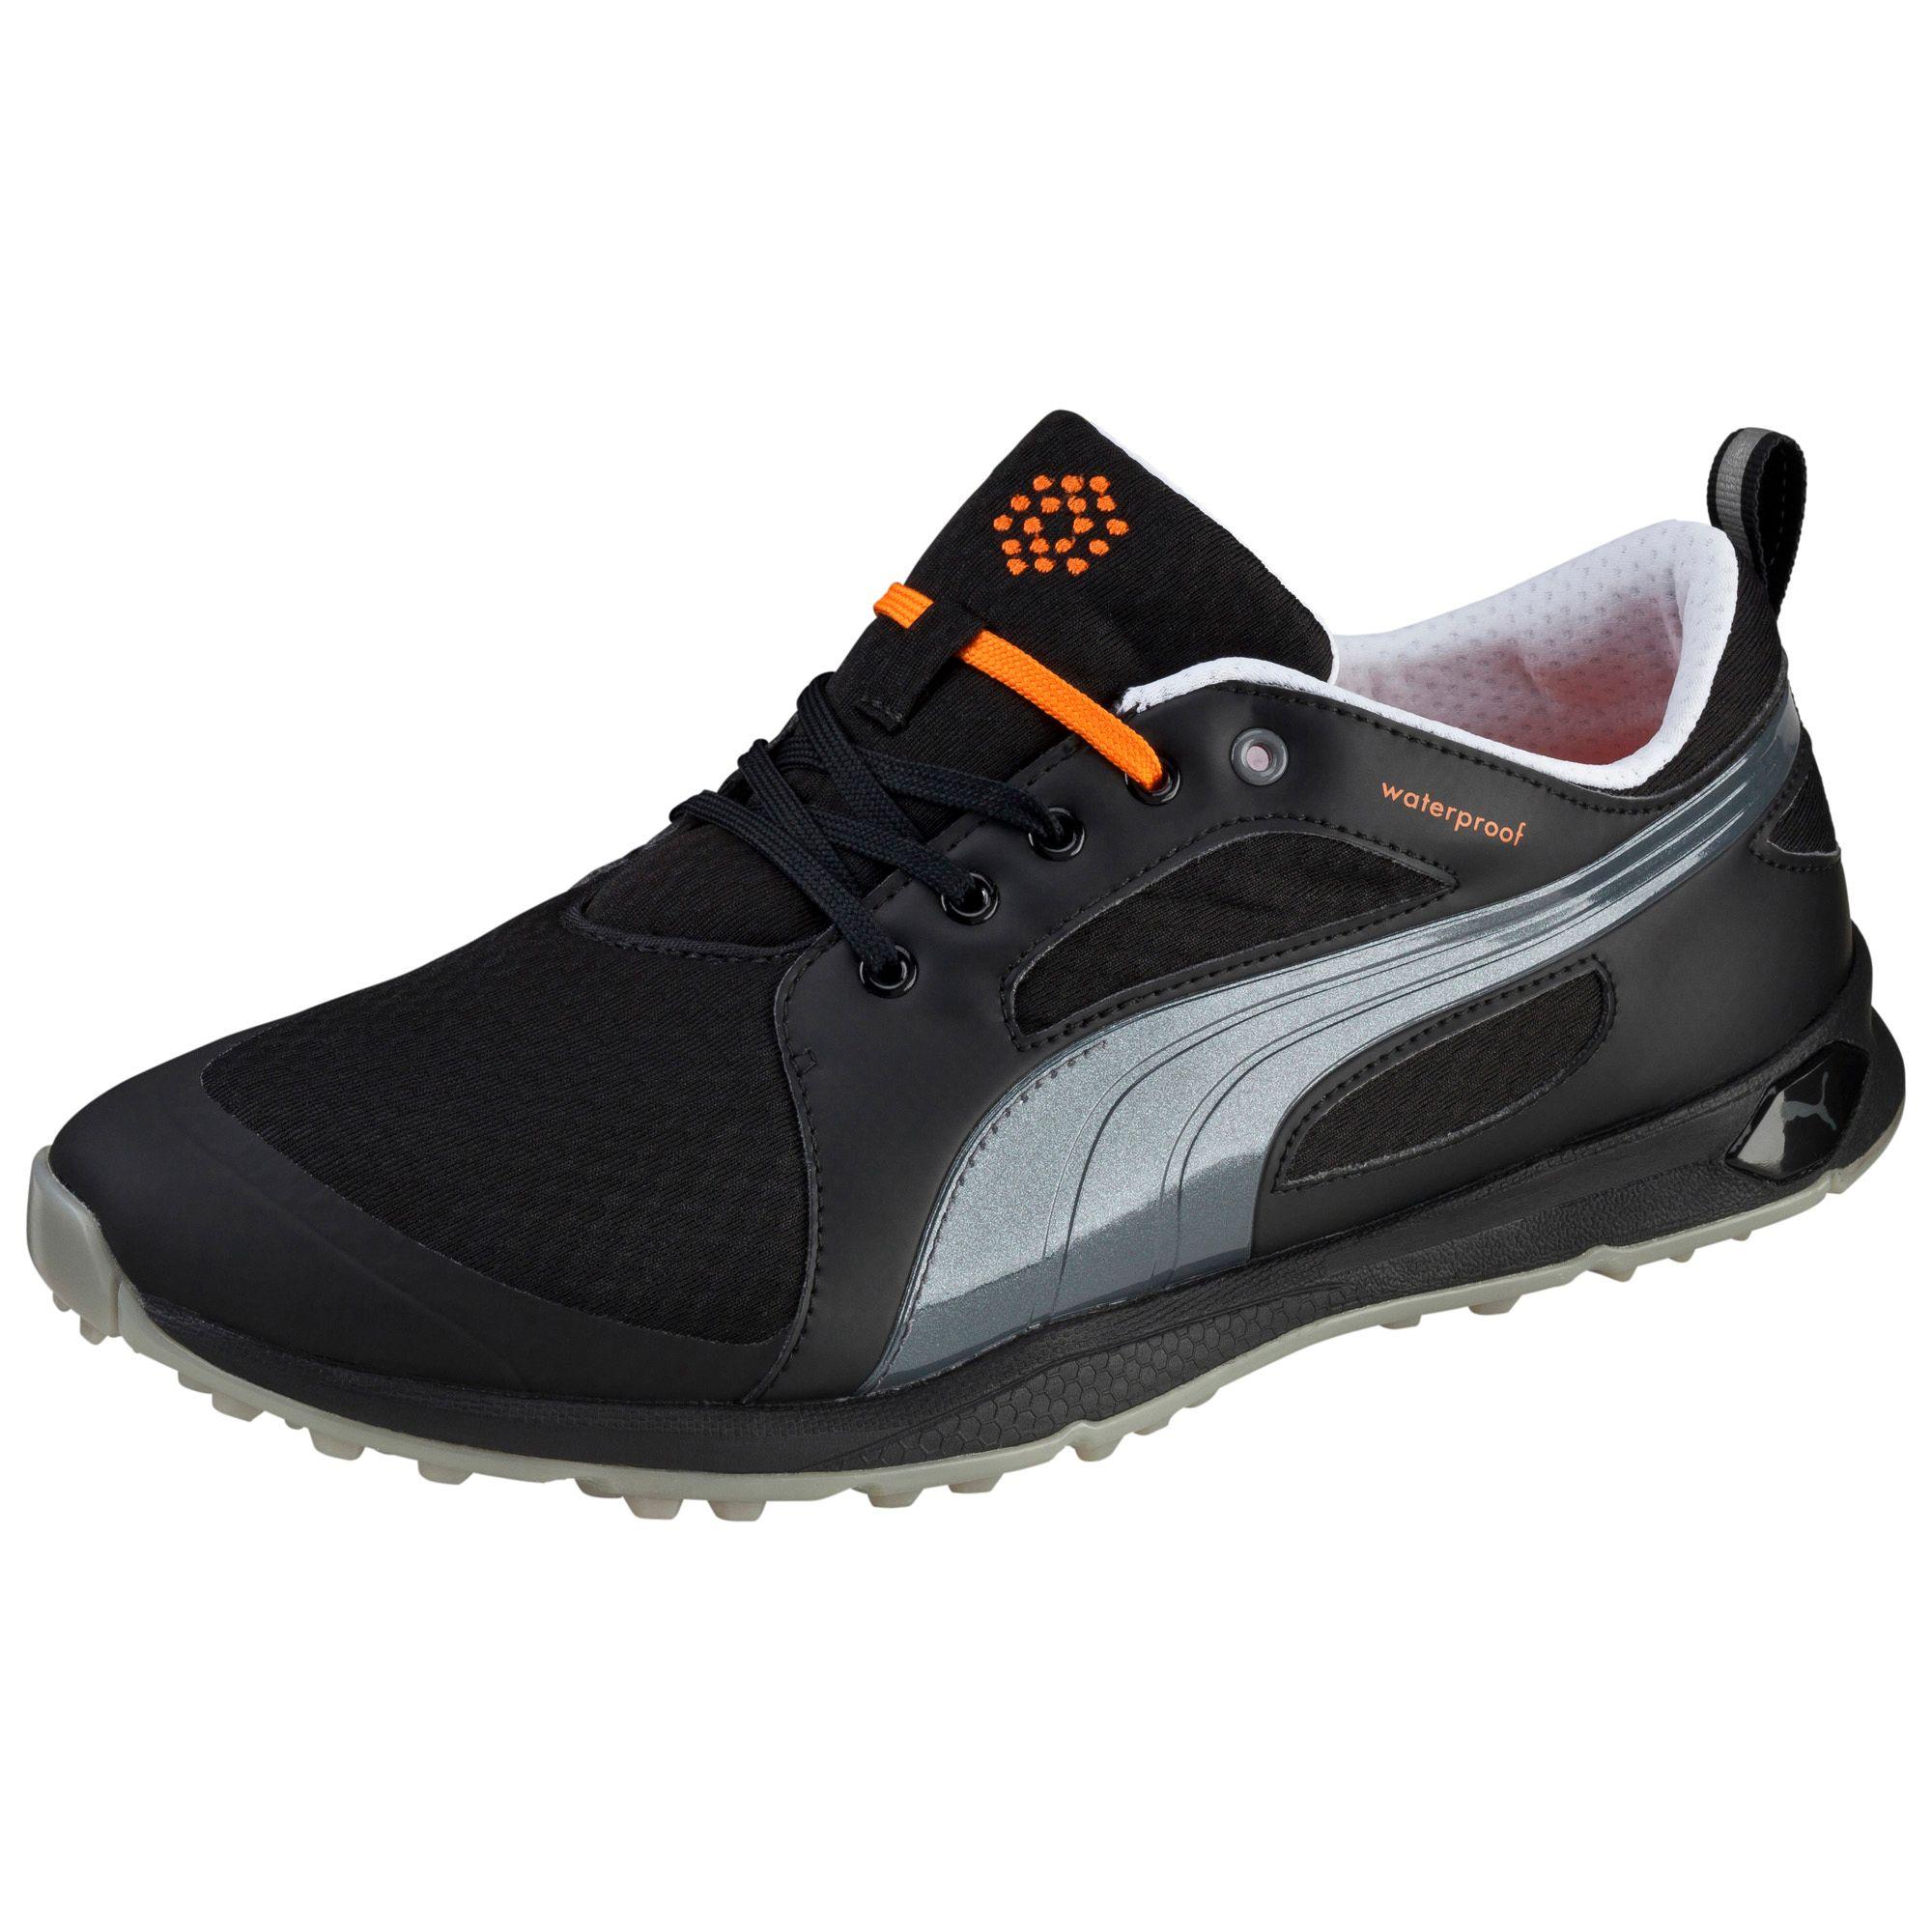 puma chaussure de golf biofly mesh chaussures golf homme nouveau ebay. Black Bedroom Furniture Sets. Home Design Ideas